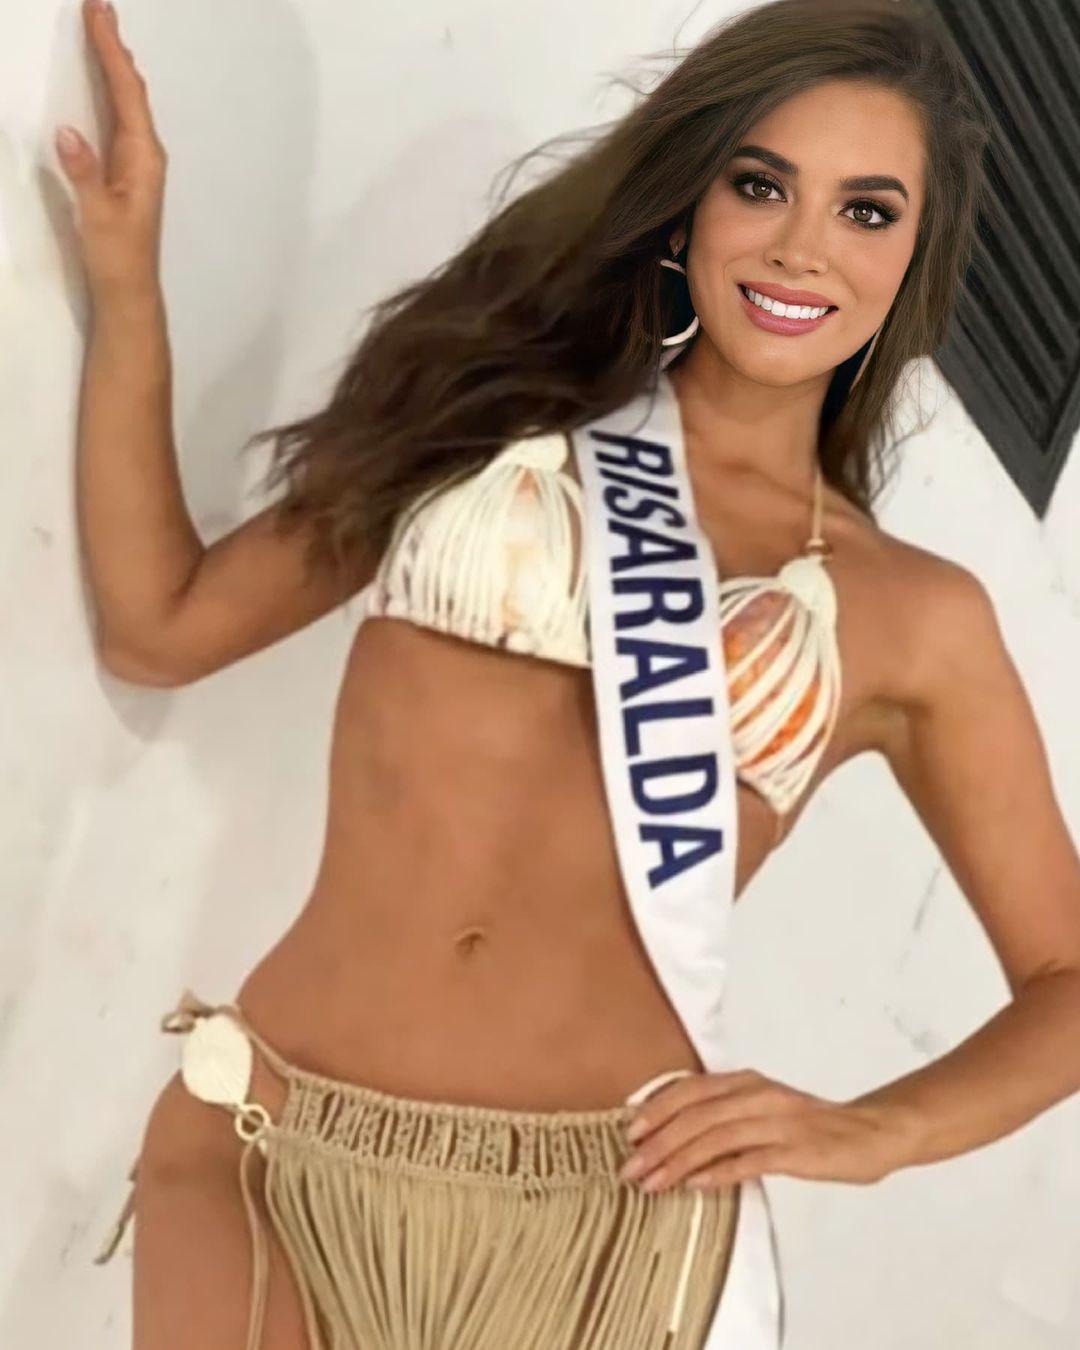 maria alejandra lopez perez, top 2 de miss universe colombia 2021/reyna hispanoamericana 2013/miss caraibes hibiscus 2014/miss colombia mundo 2015. - Página 4 24101414